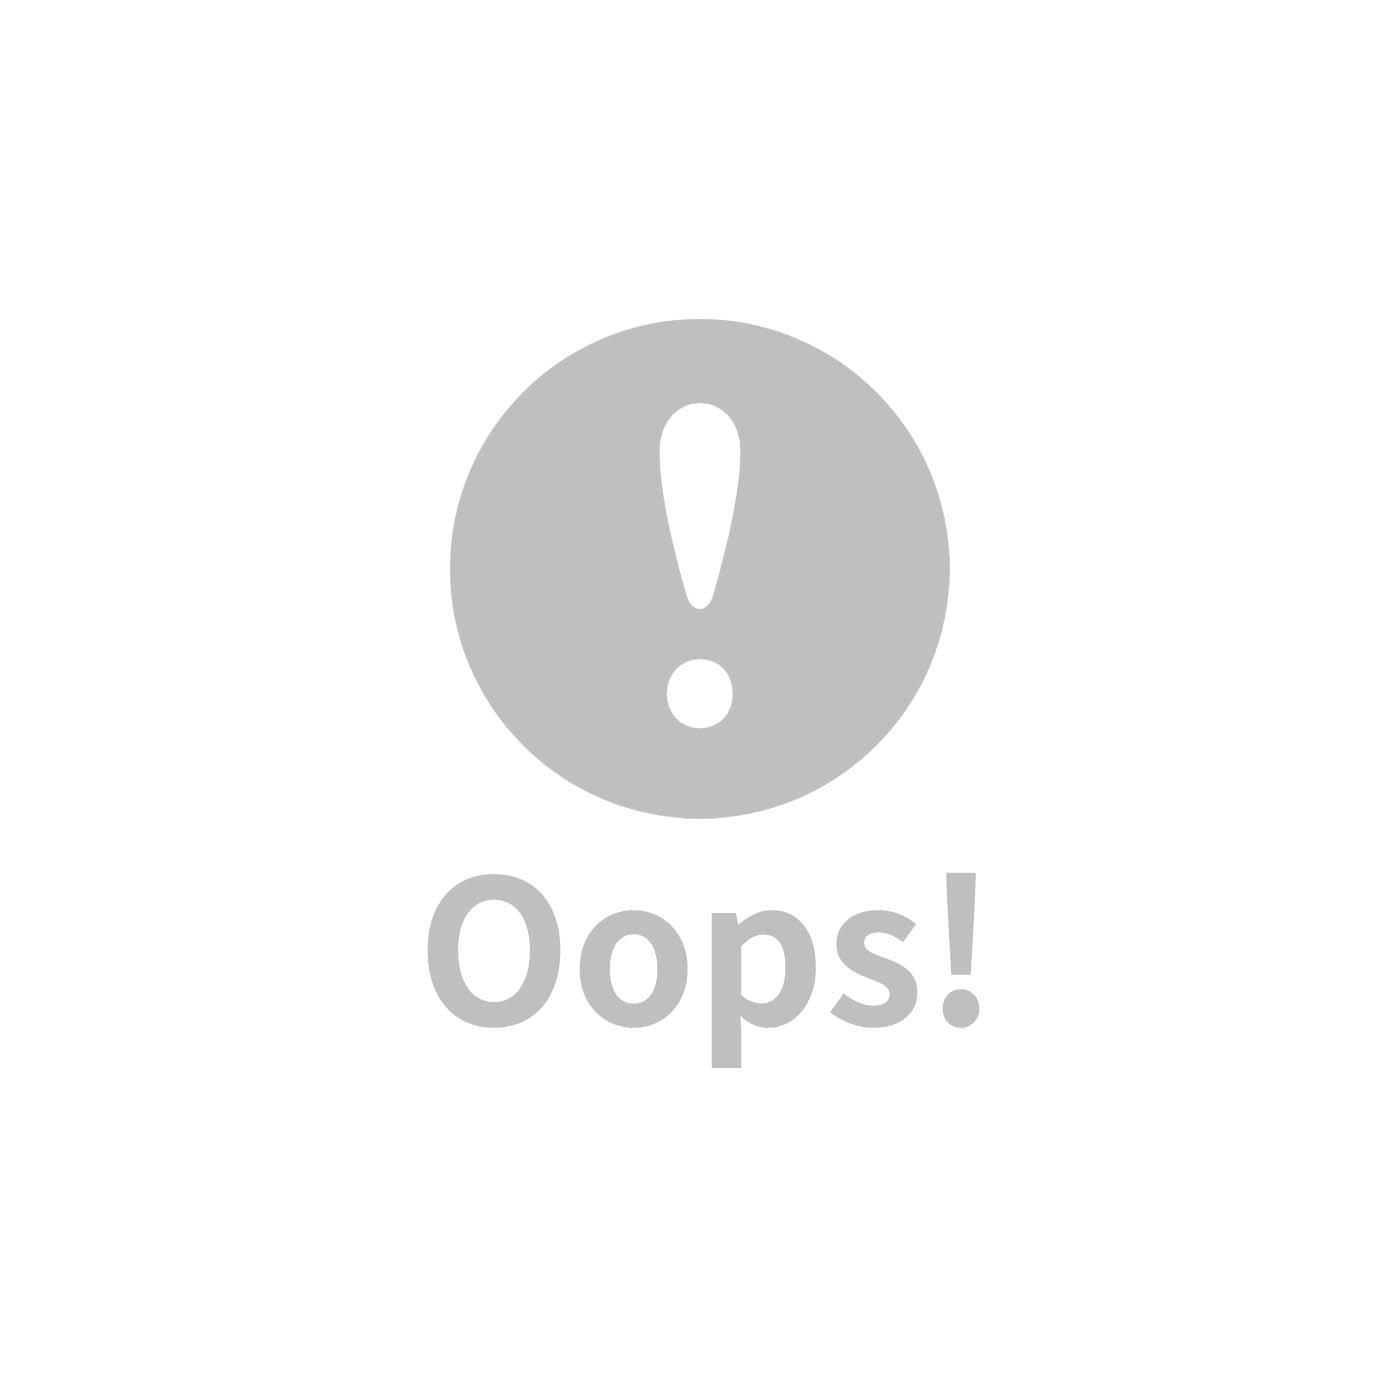 Soopsori全腦開發‧原粹木積木(元氣早餐吧)